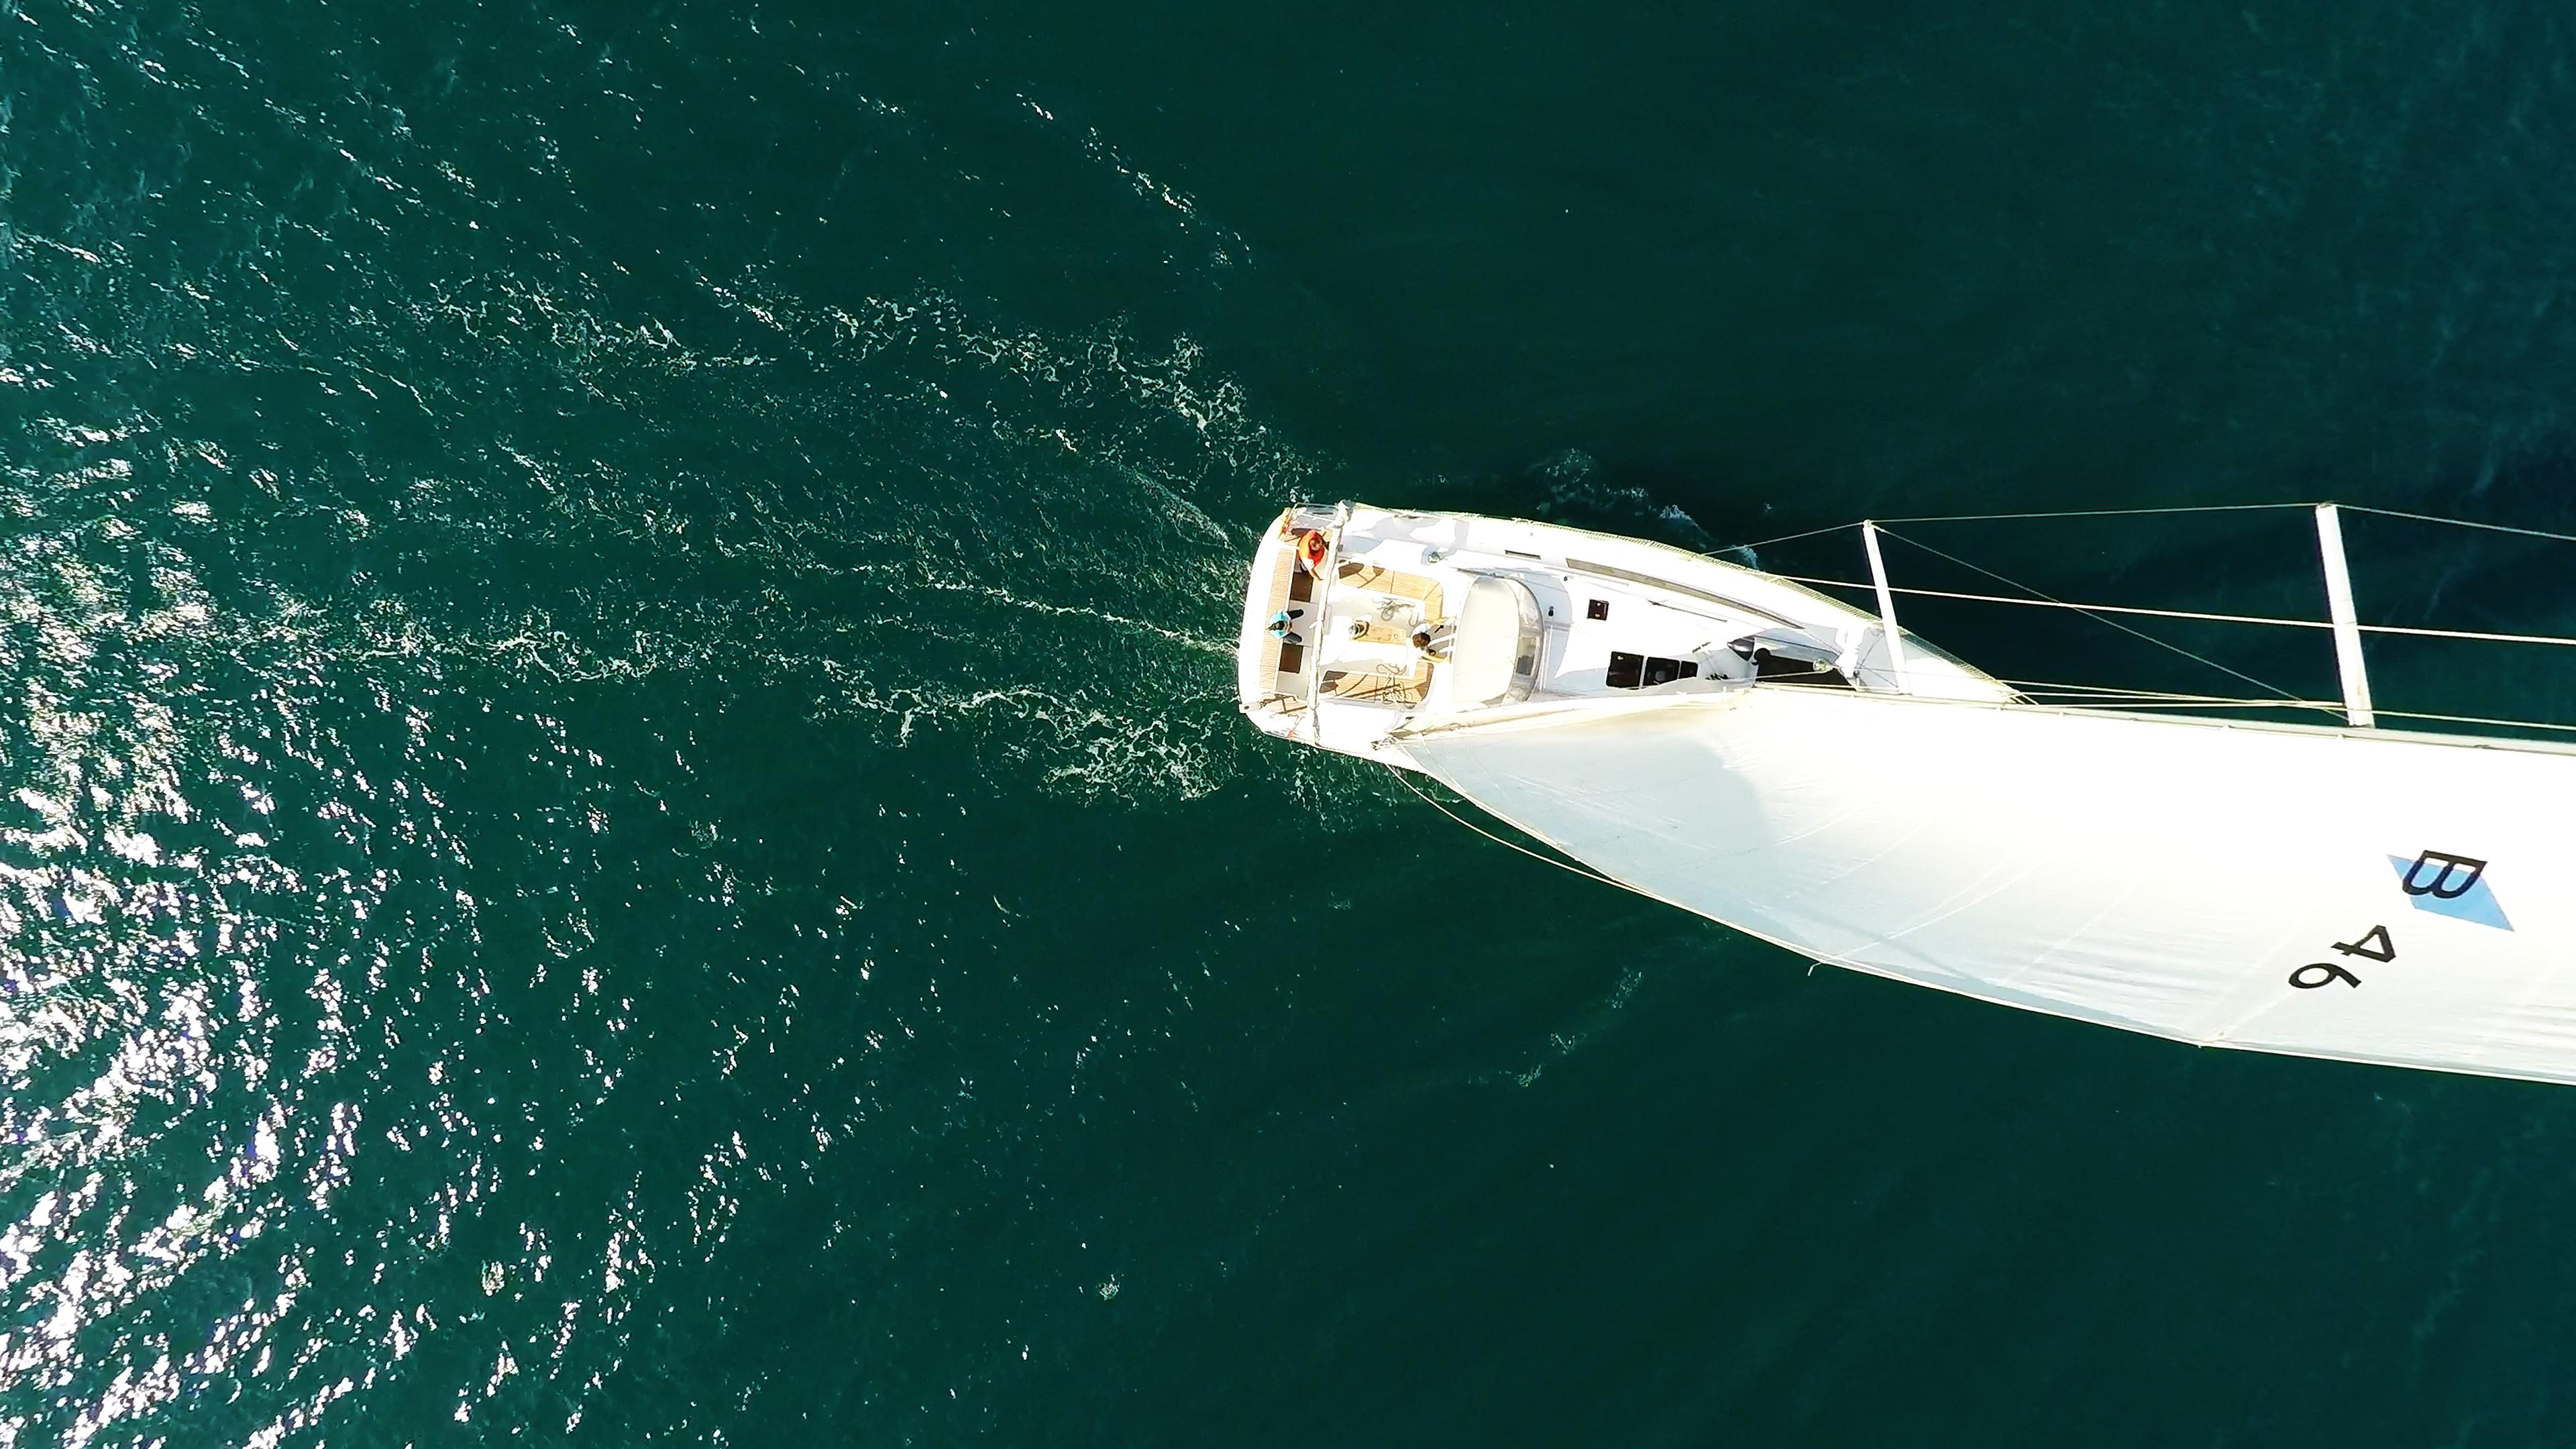 barcha a vela bavaria 46 randa pozzetto yacht a vela